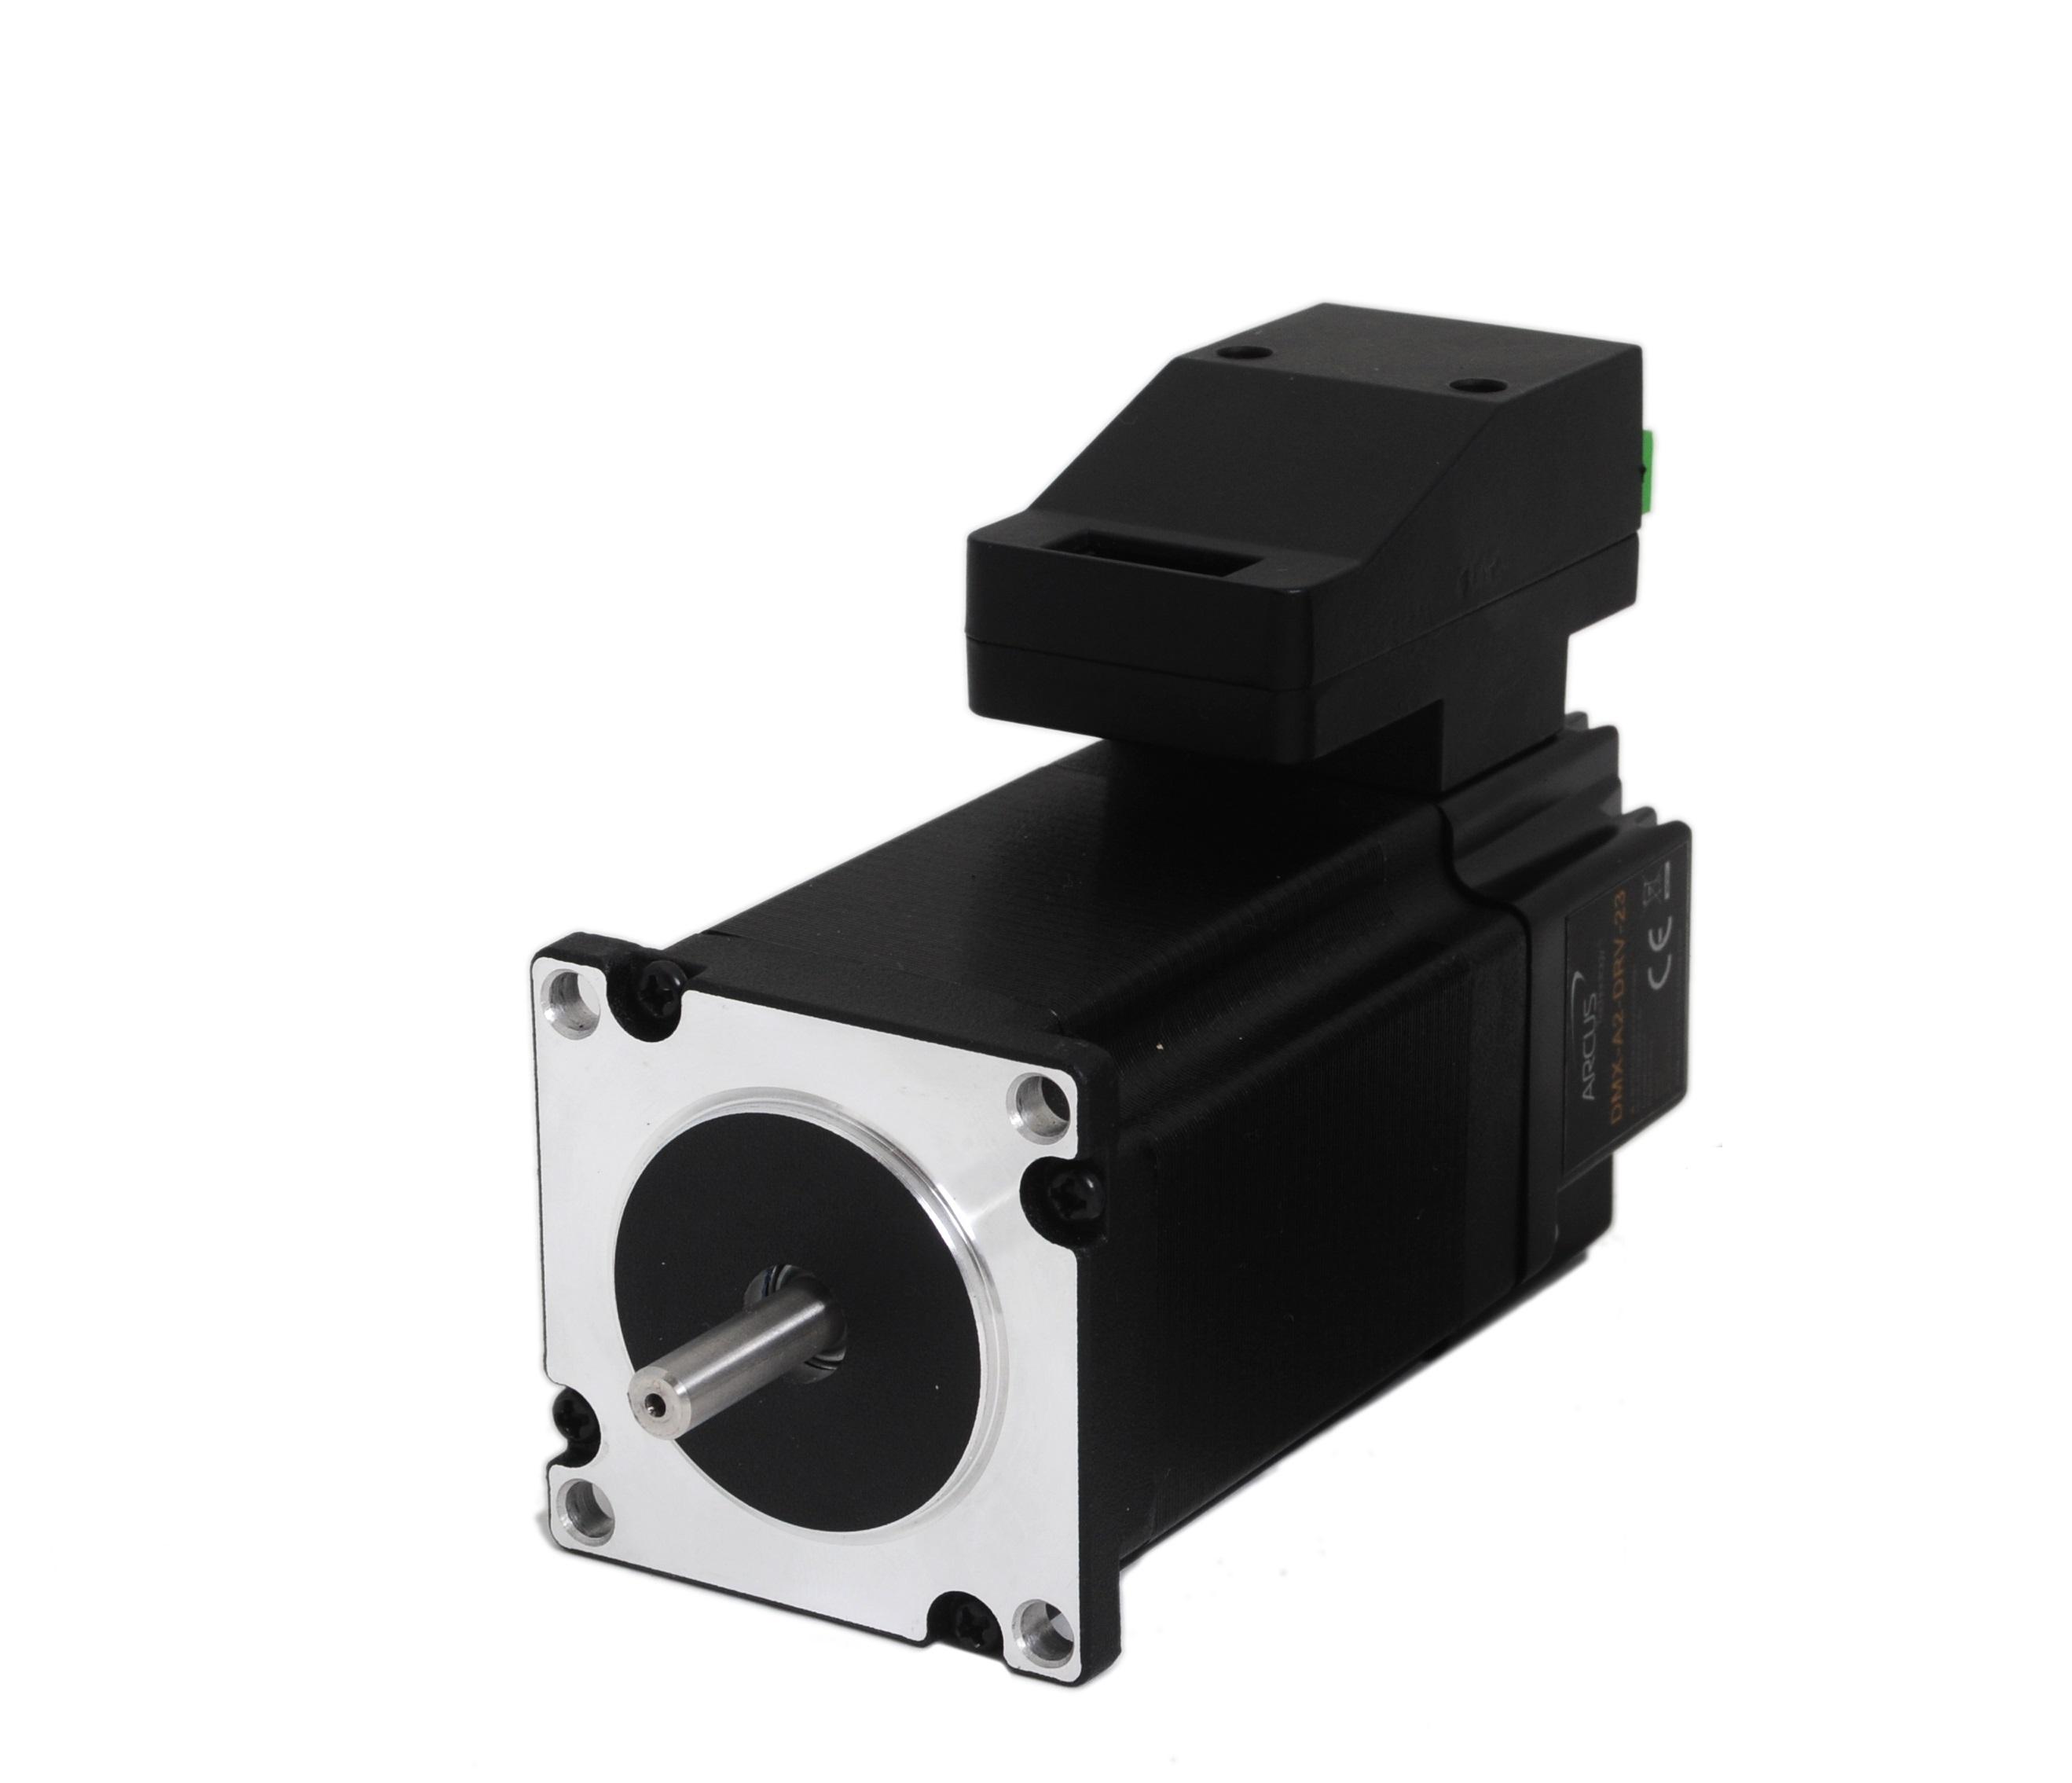 Integrated usb stepper motors arcus technology inc for Stepper motor integrated controller